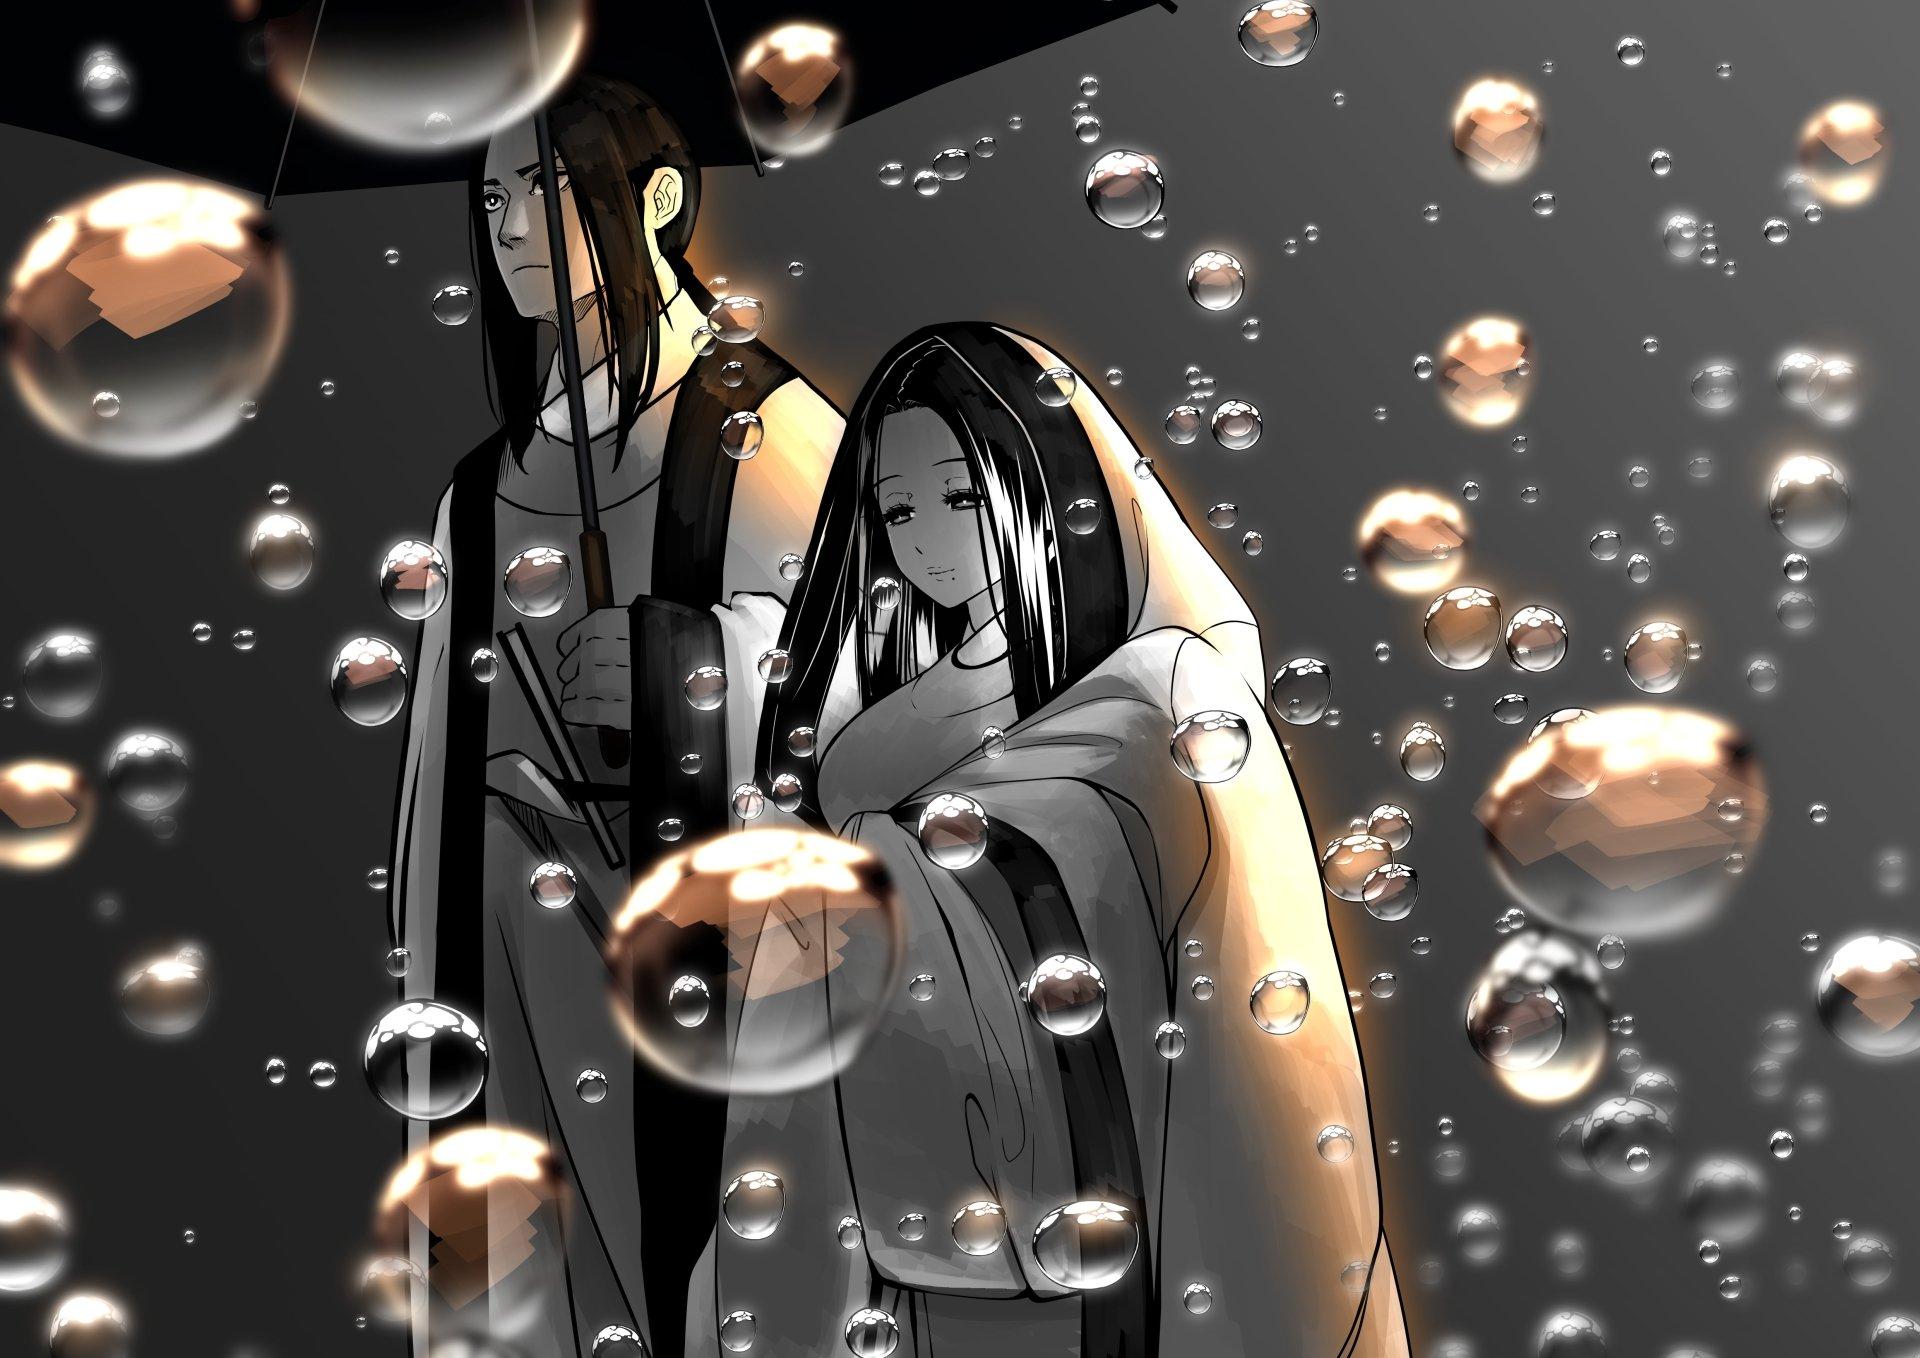 Fox Rain 4k Ultra HD Wallpaper | Background Image ...